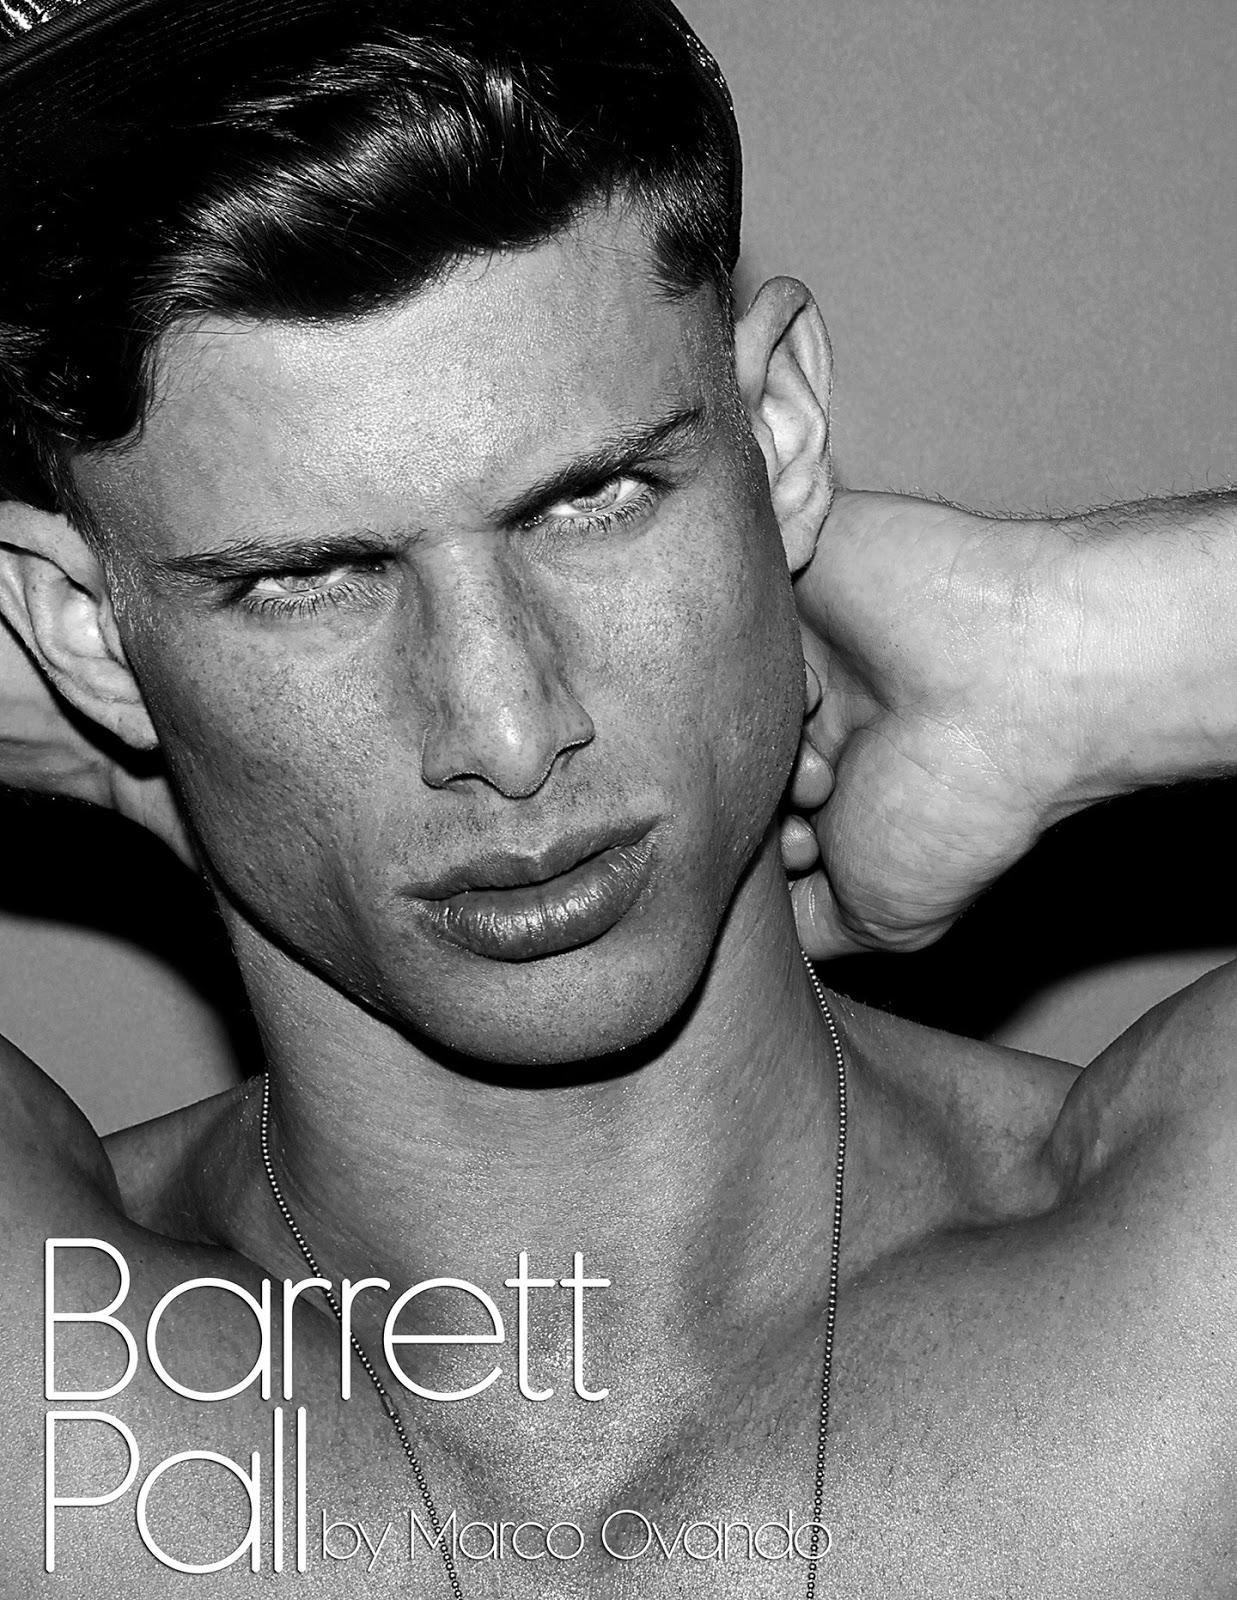 BarattPall-Homotography-MarcoOvando-01